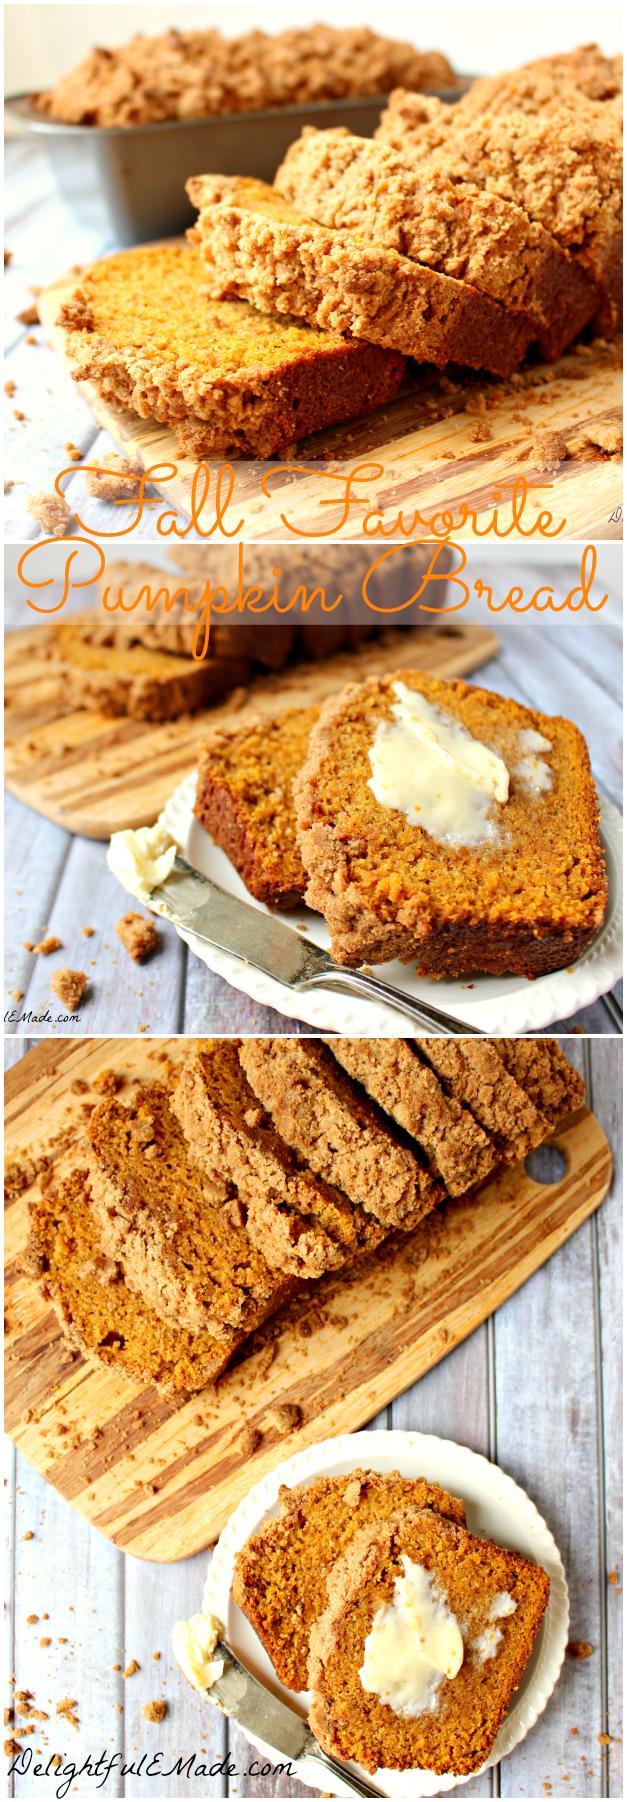 Fall Favorite Pumpkin Bread by DelightfulEMade.com